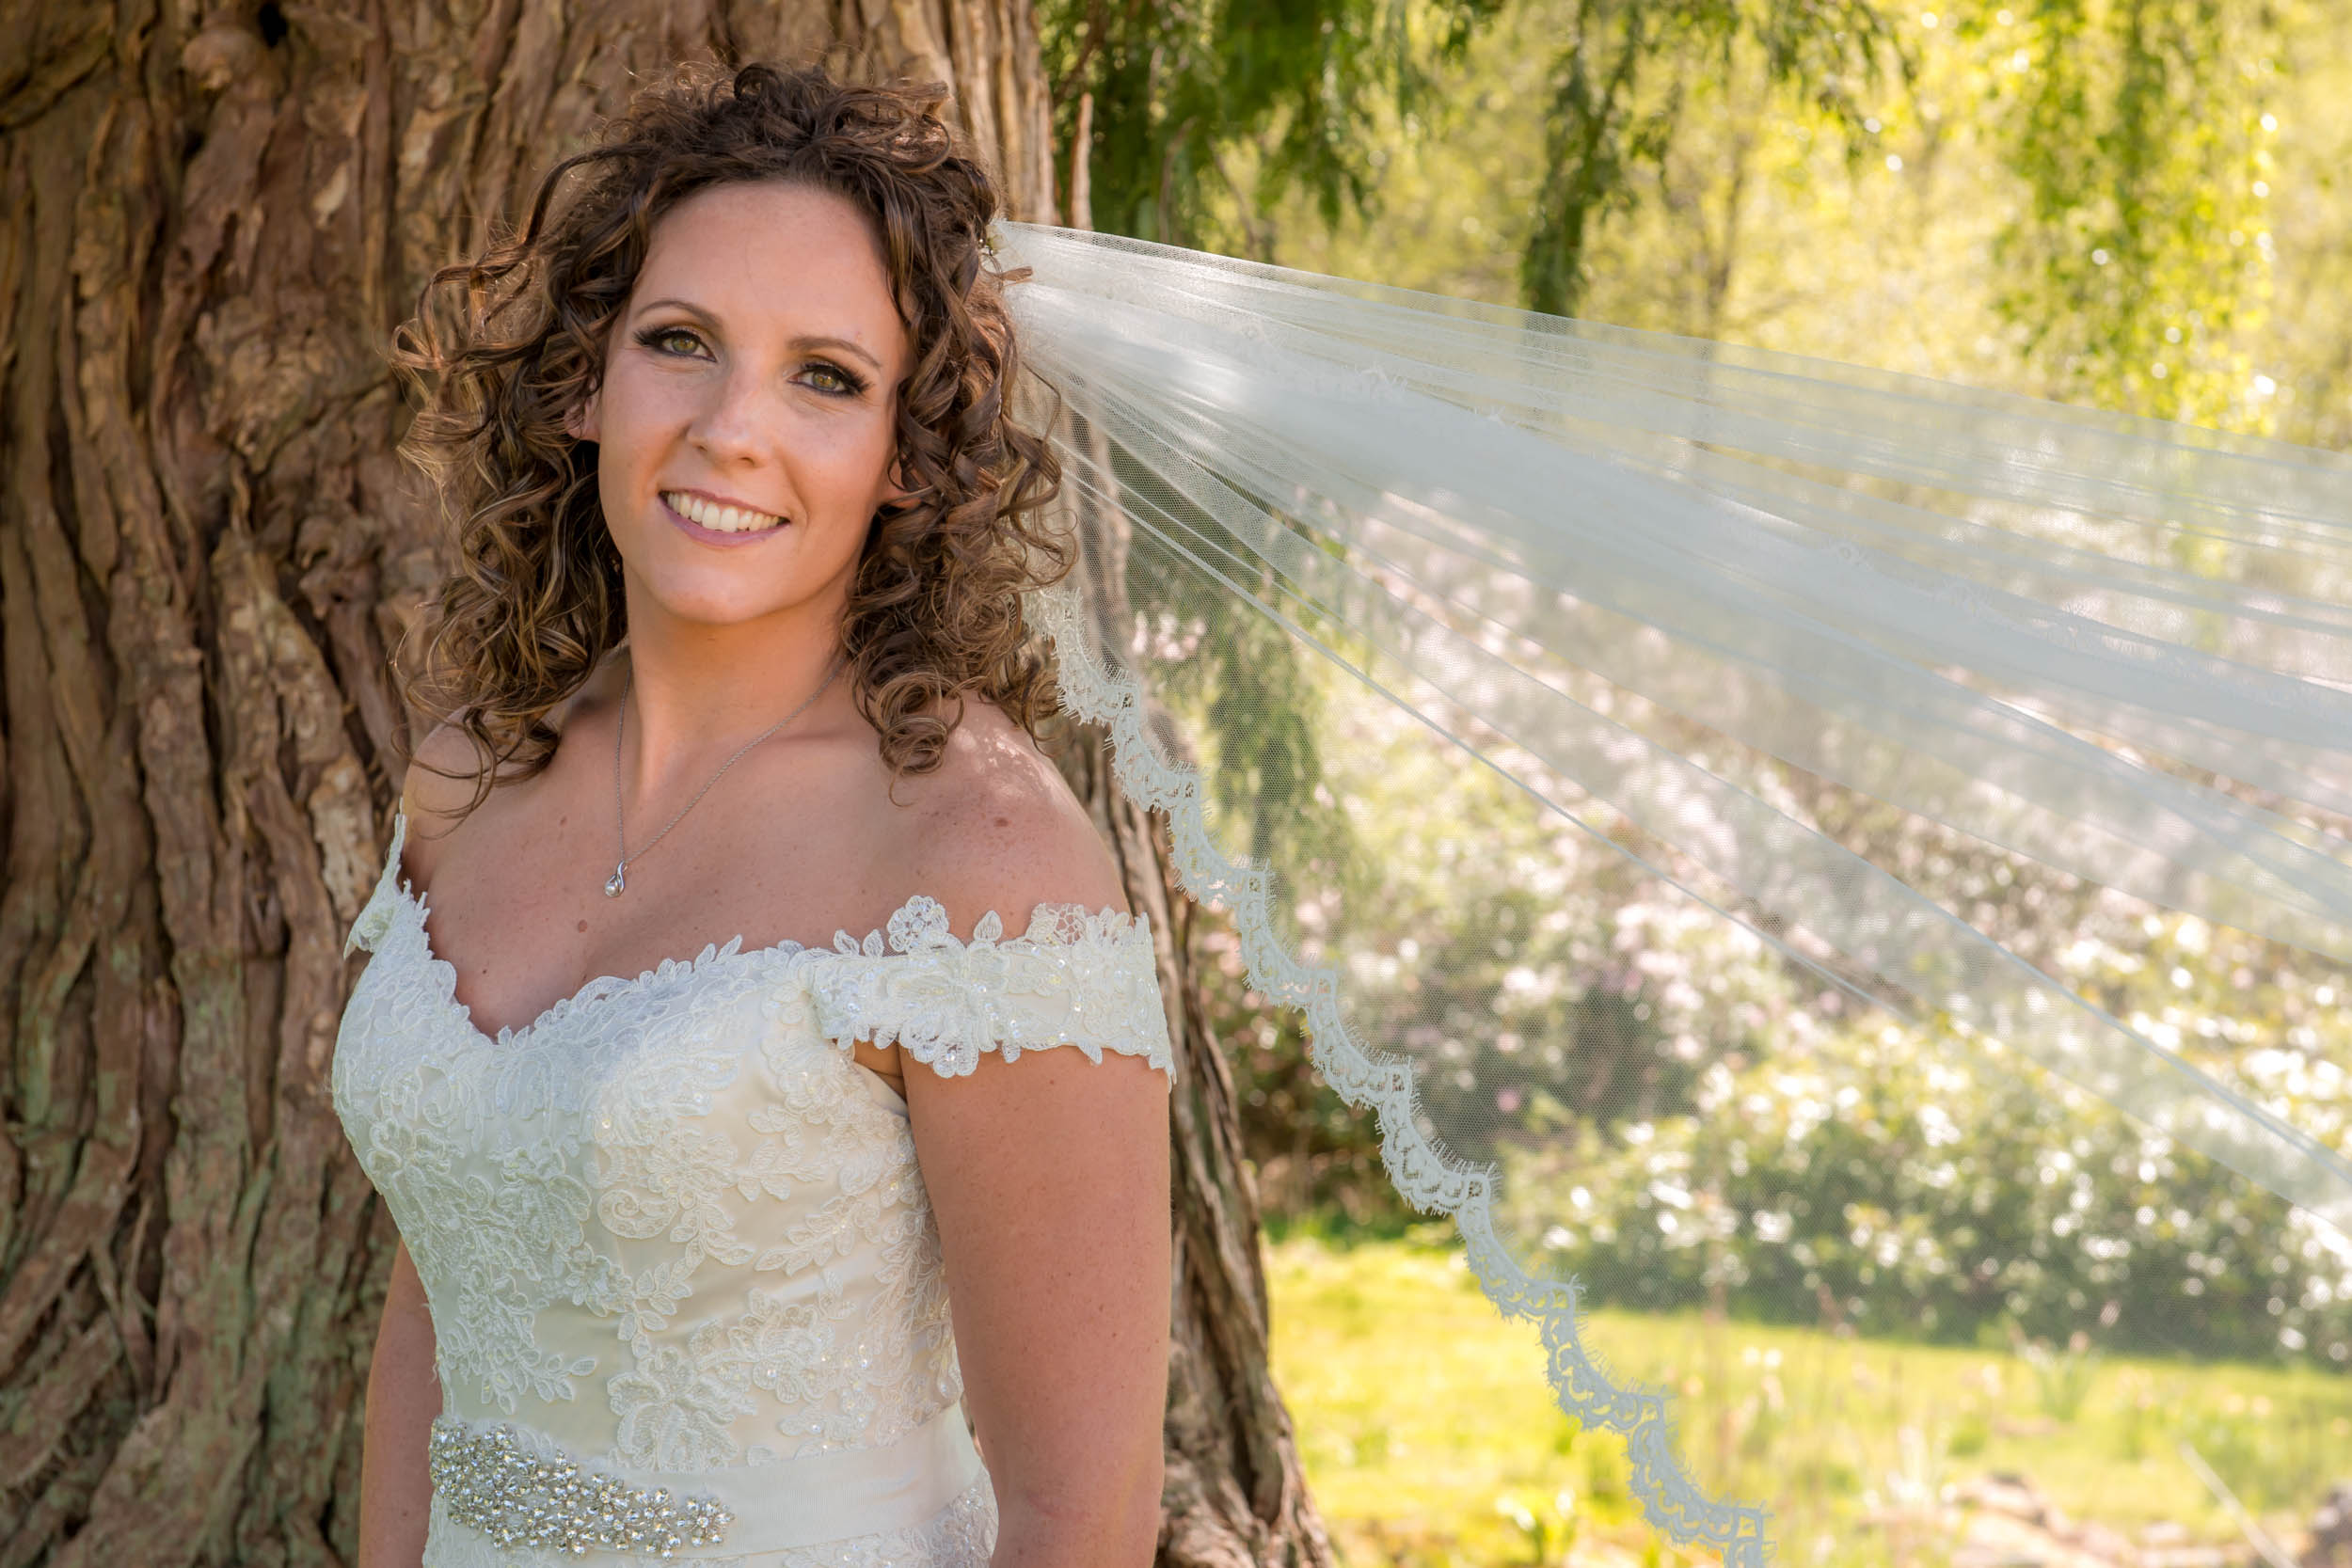 Paul-Saunders-Wedding-Photography-9779.jpg